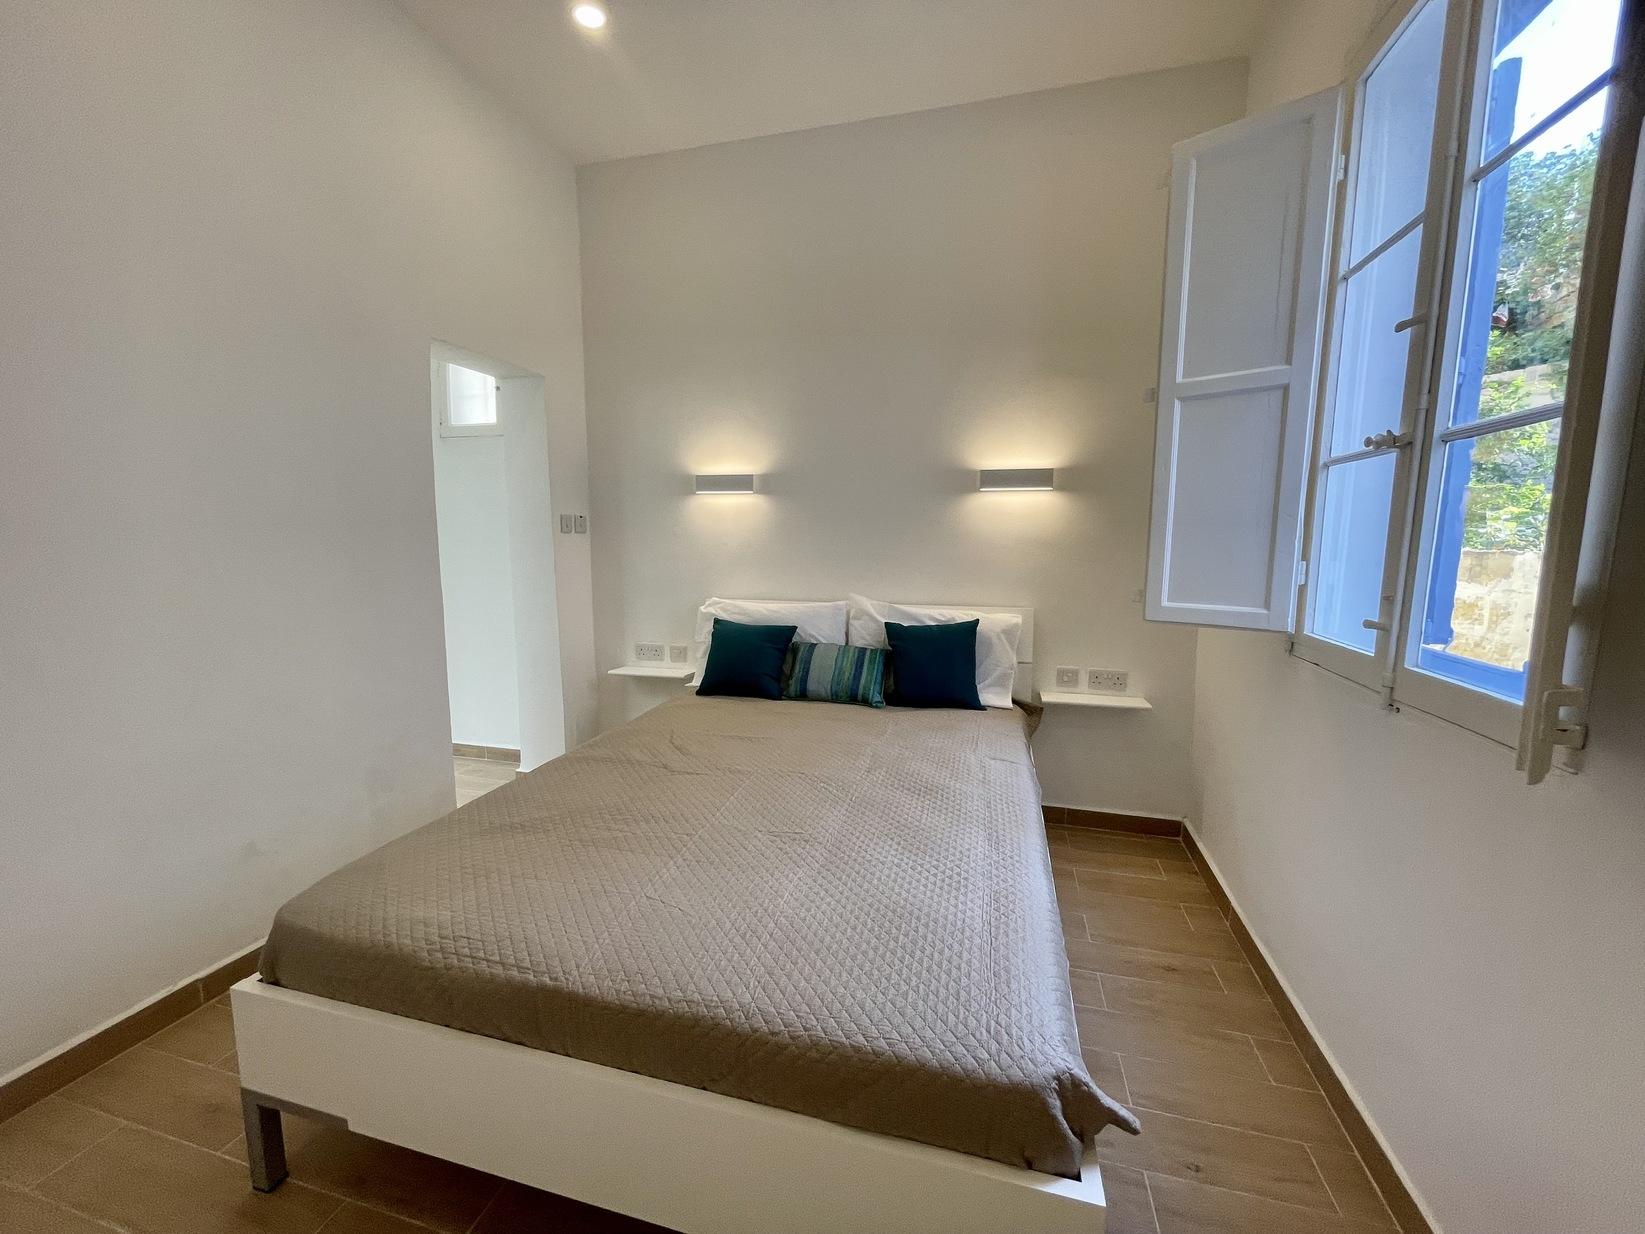 3 bed Town House For Rent in Kalkara, Kalkara - thumb 12